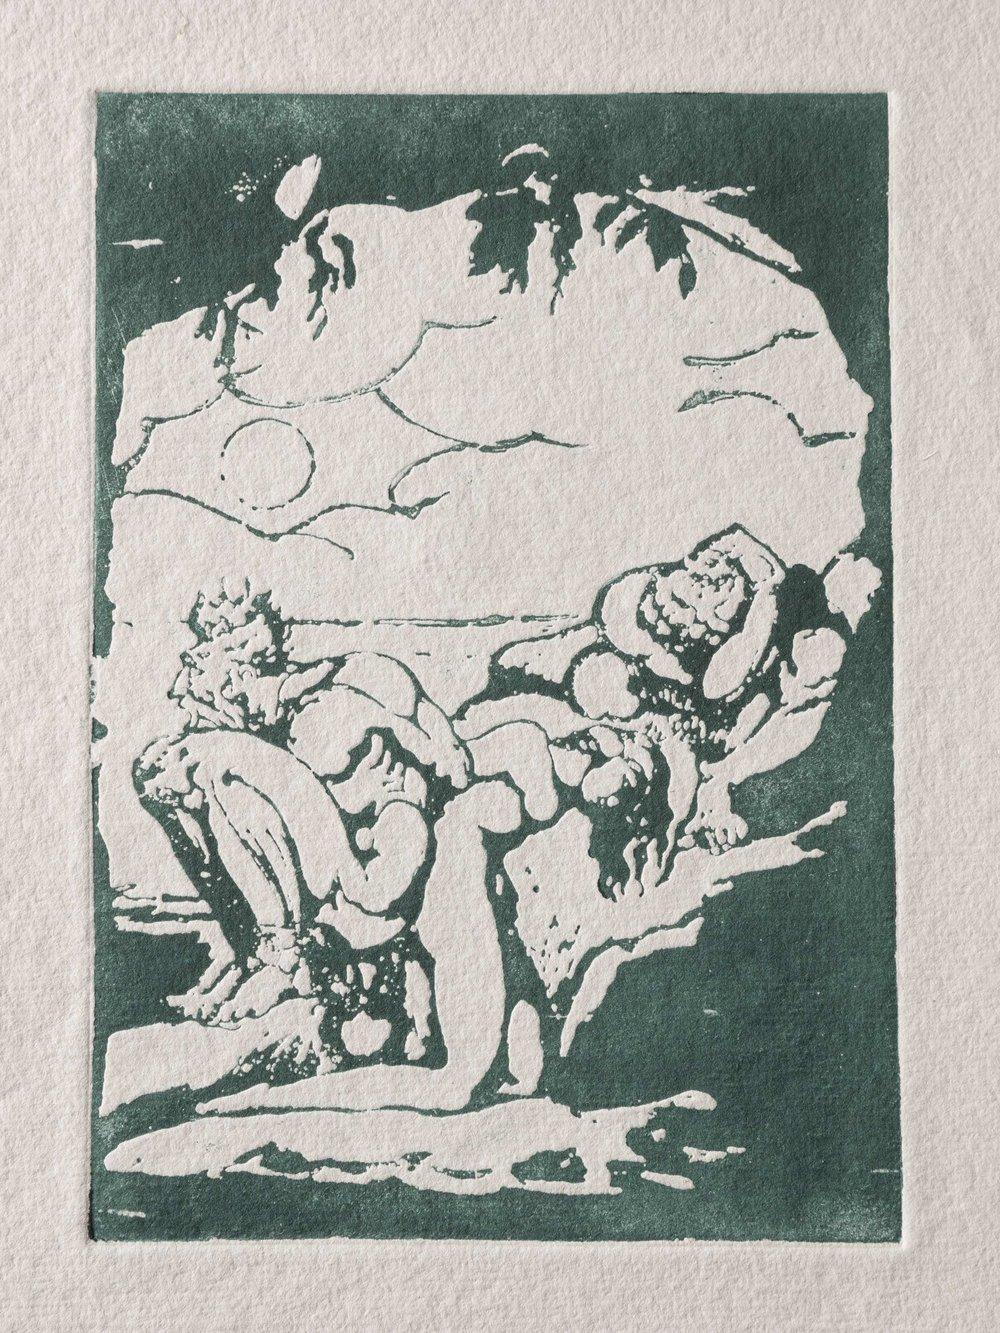 William-Blake-Daughters-of-Albion.jpg